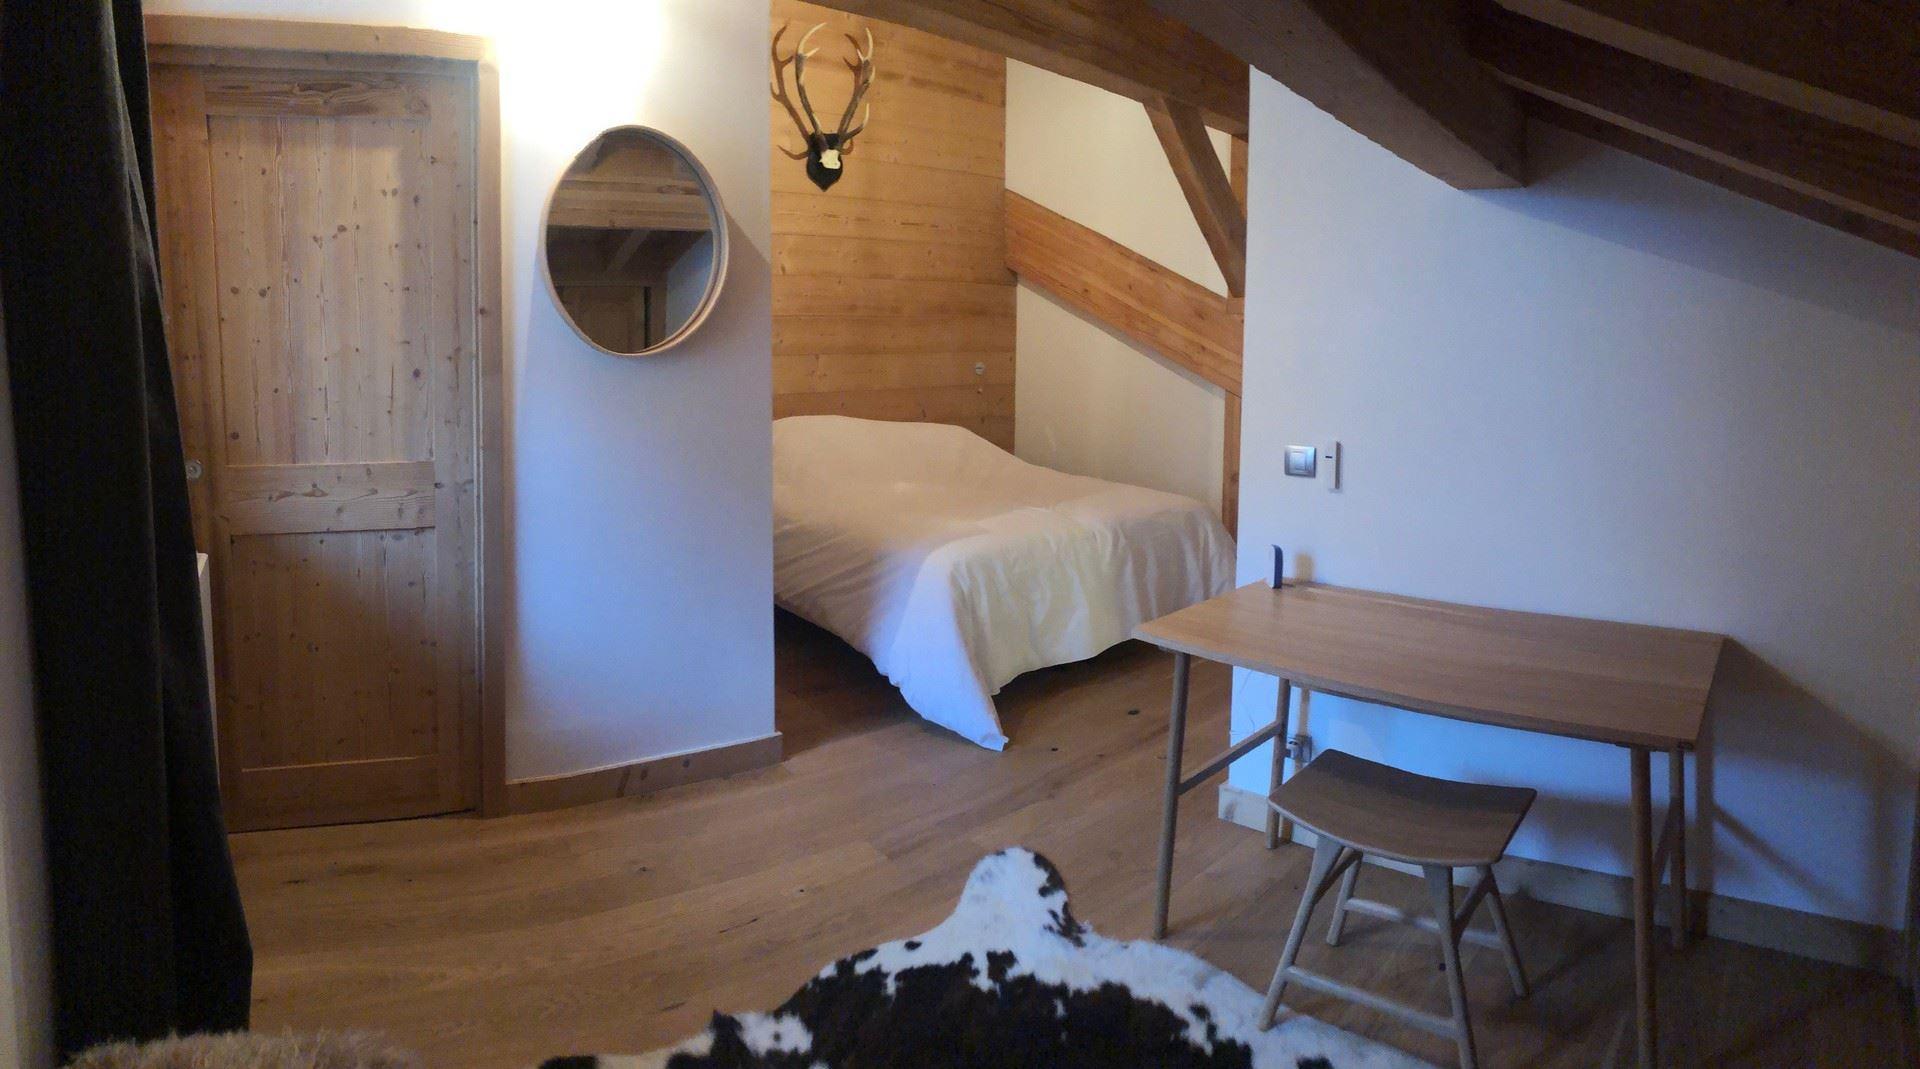 4 Room 6 Pers ski-in ski-out / CASEBLANCHE D17